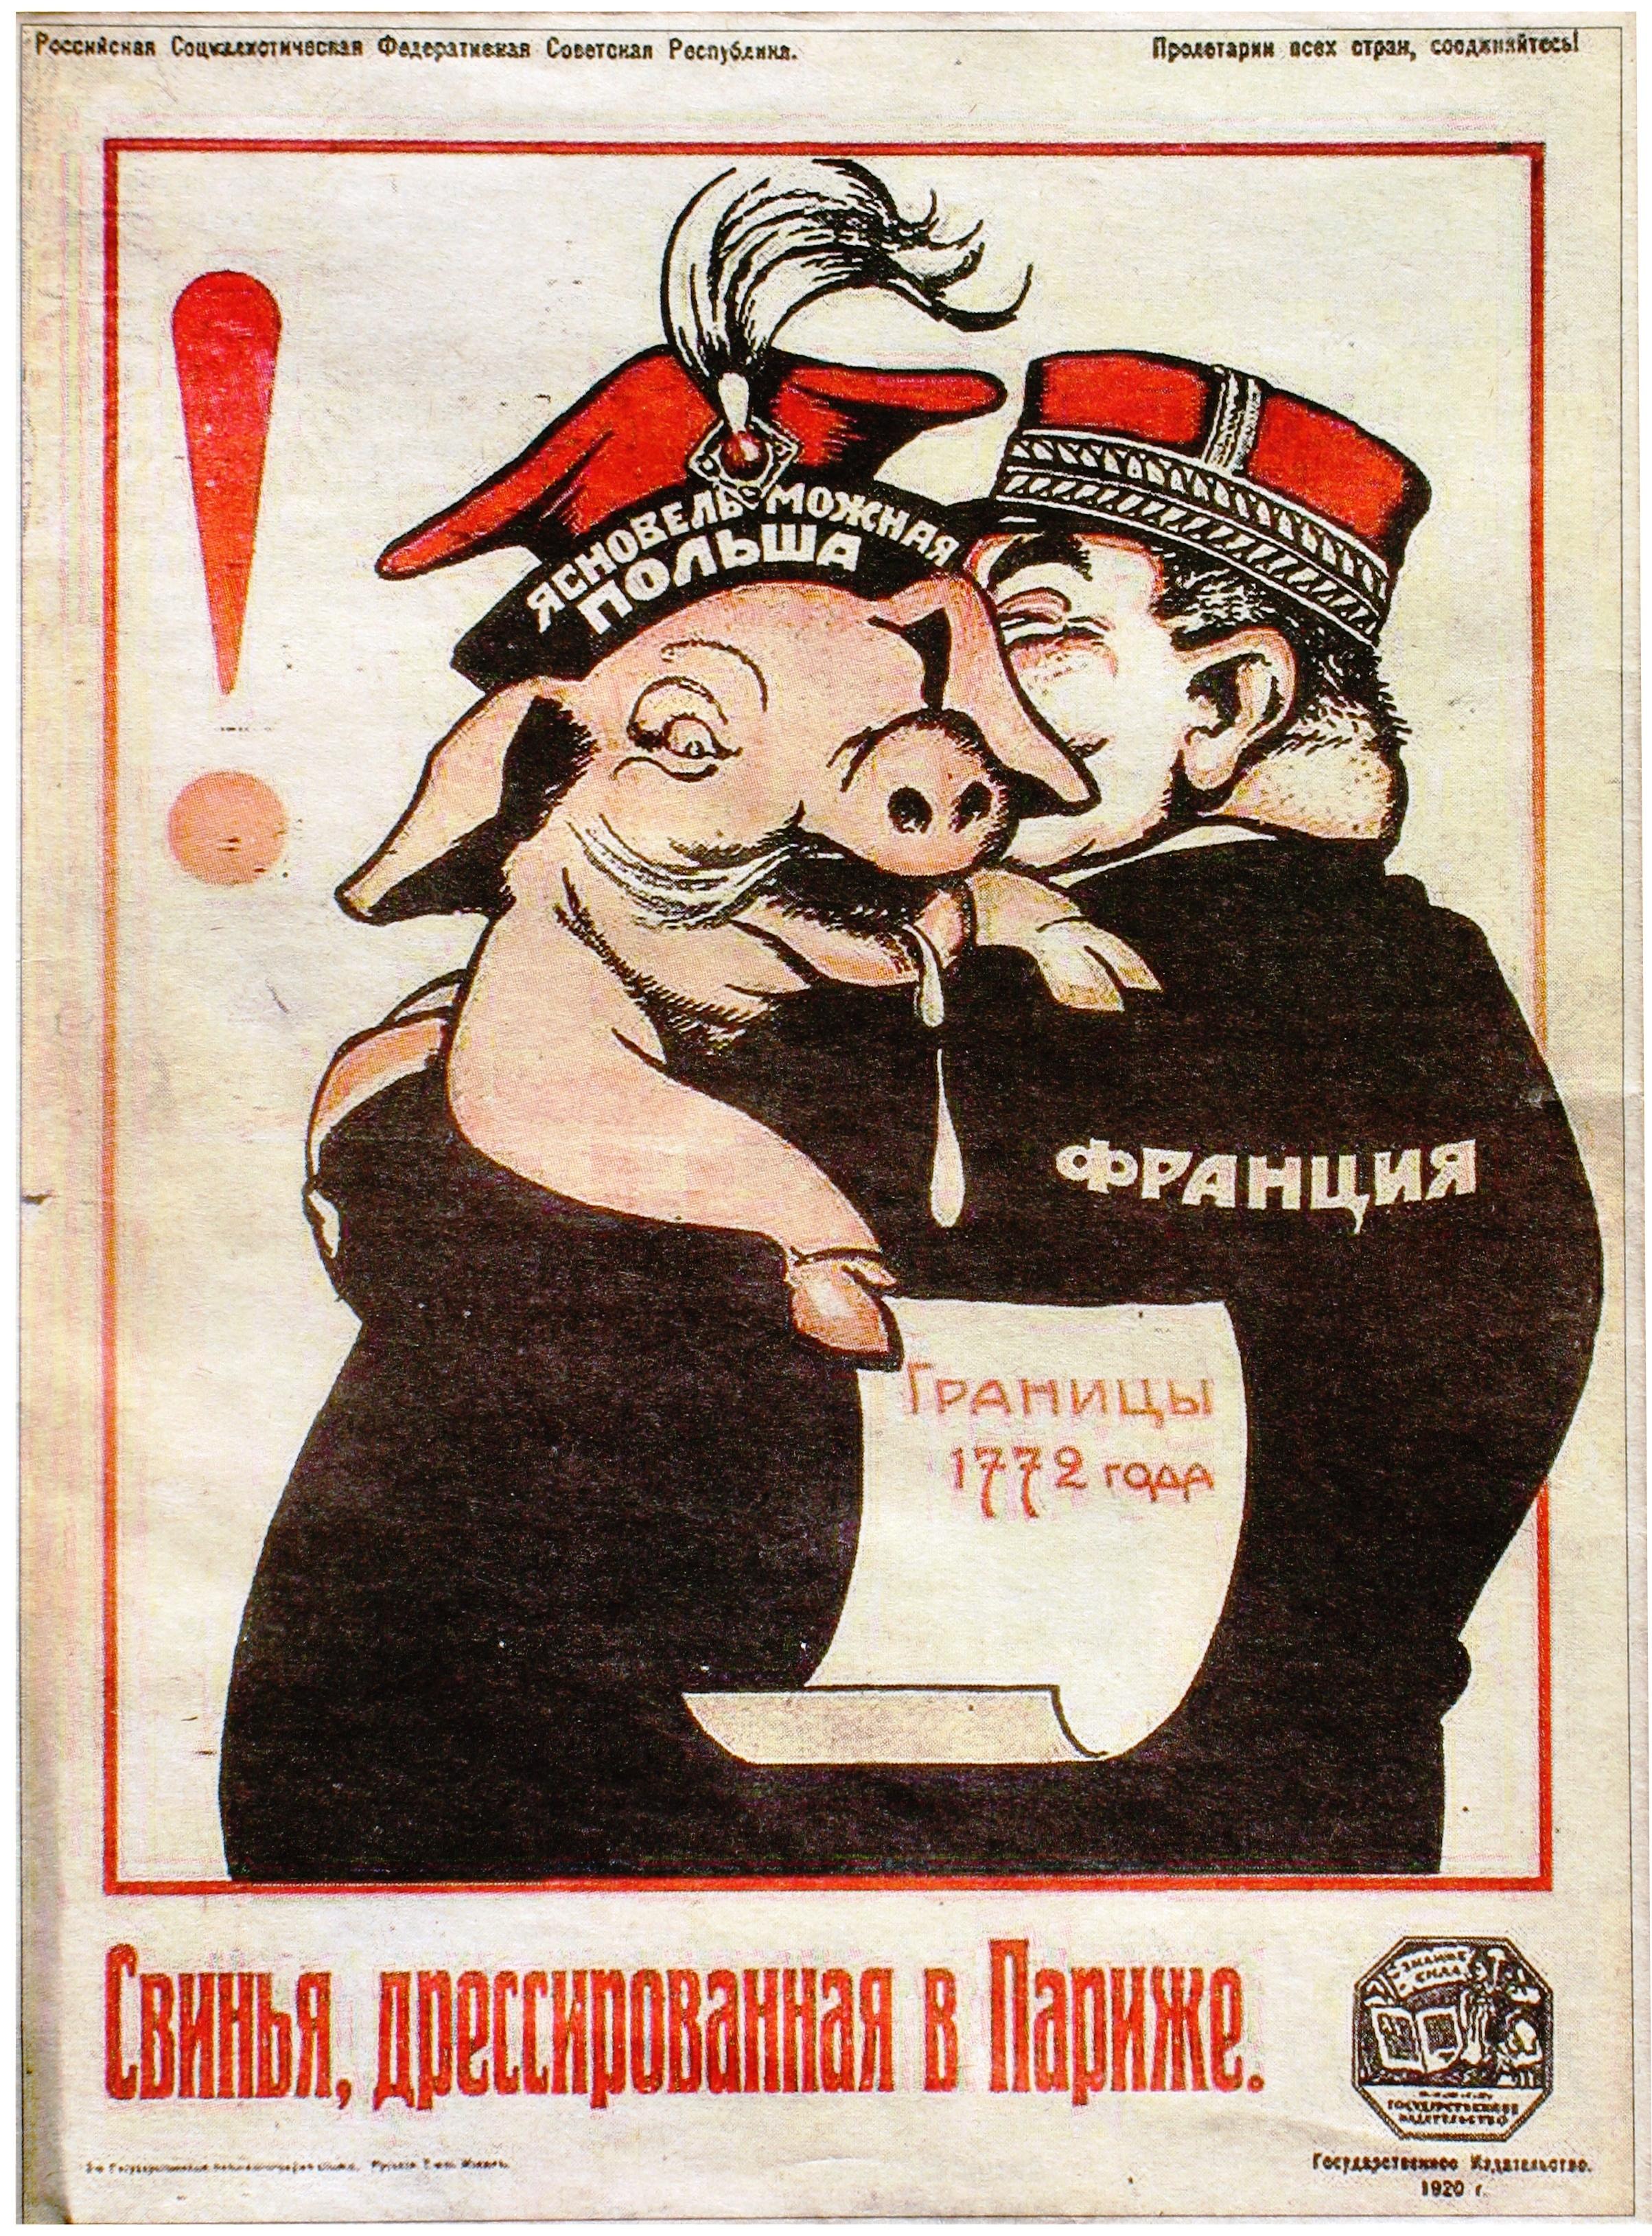 http://upload.wikimedia.org/wikipedia/commons/8/85/Ясновельможная_Польша_плакат_РСФСР_1920.jpg?uselang=ru